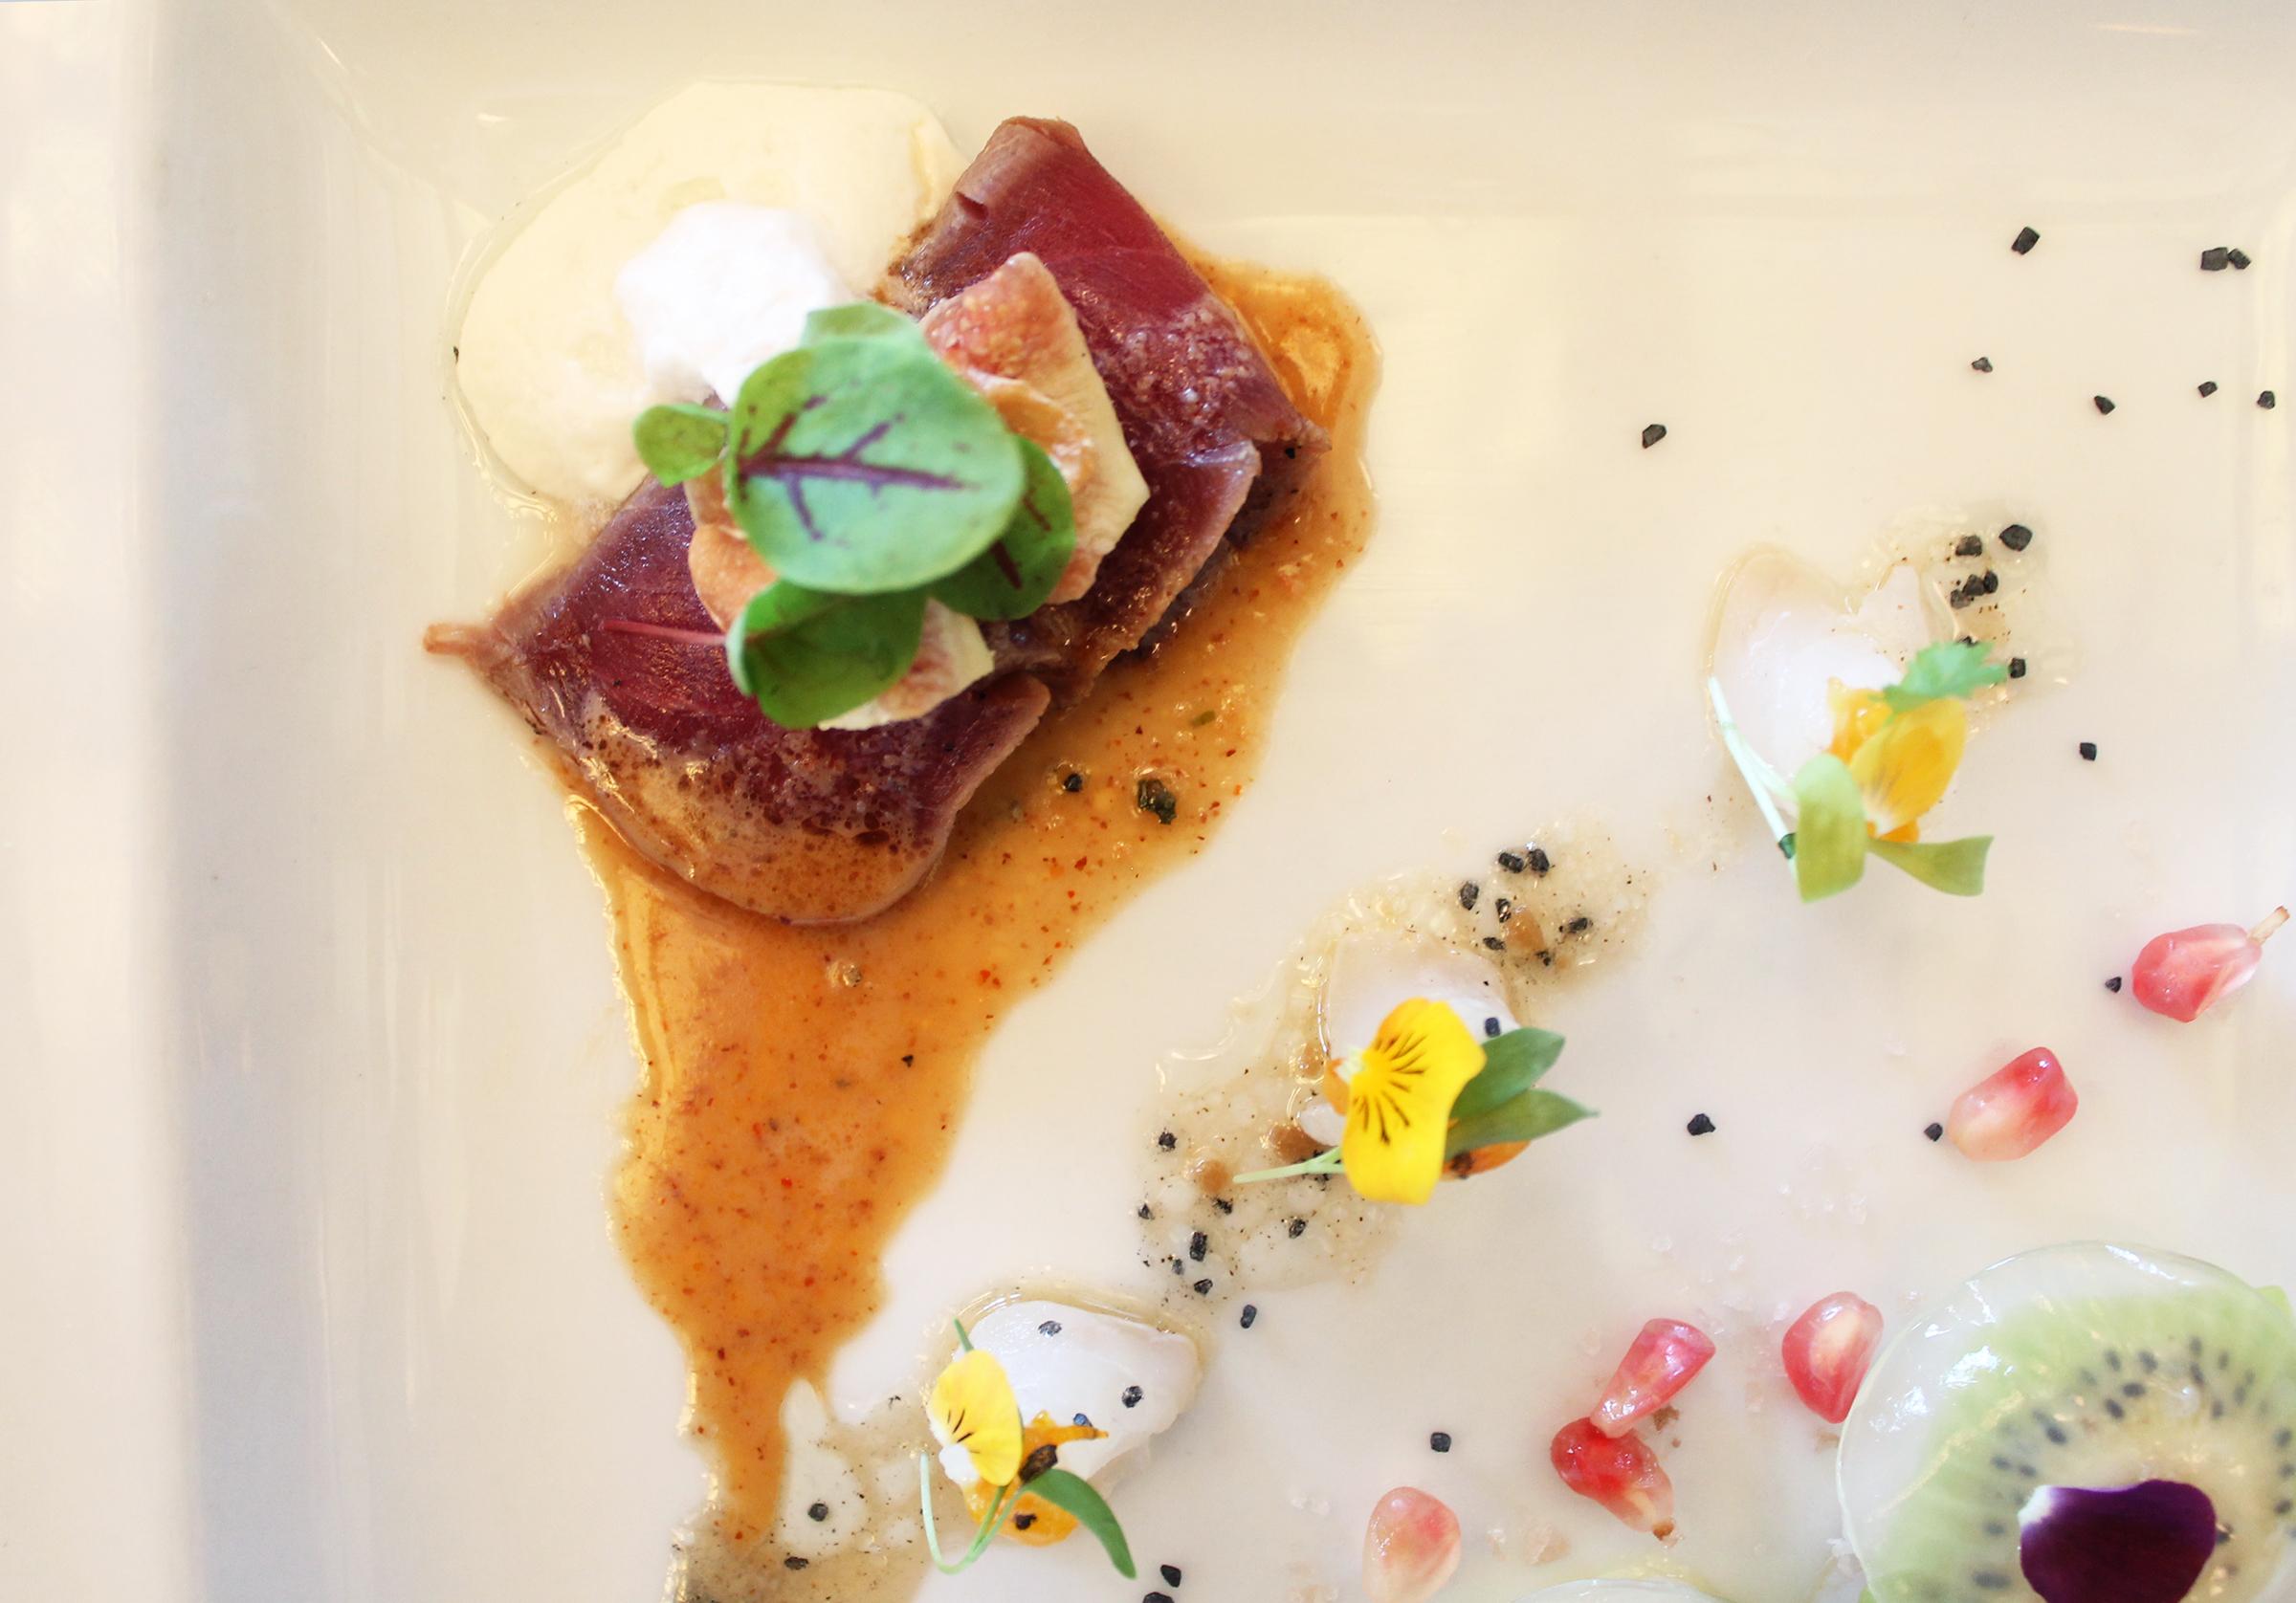 Seared Bluefin Tuna with Almond Sauce and Goat Cheese Foam, Fig Garlic Chip. Fluke Kumquat with Yuzu Dressing, Kumquat Jam, Cilantro, and Black Lava Salt